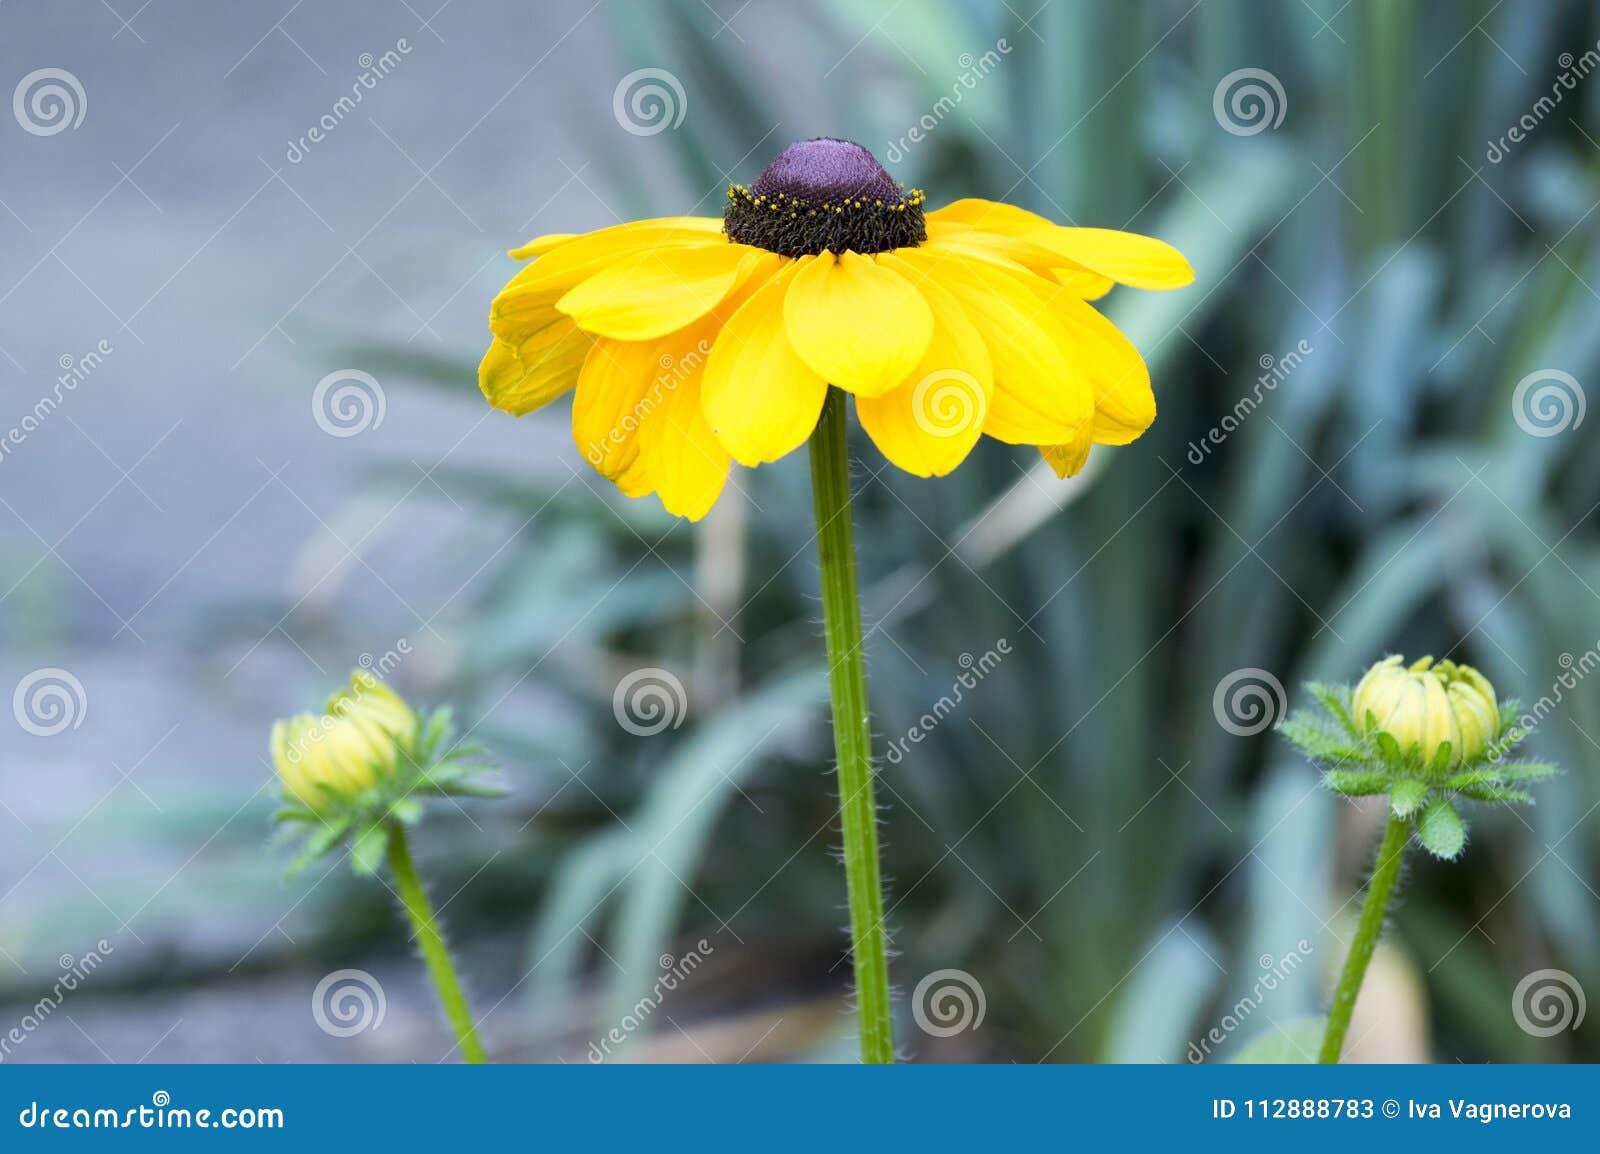 Rudbeckia Hirta Black Eyed Susan Flower With Yellow Petals And Dark